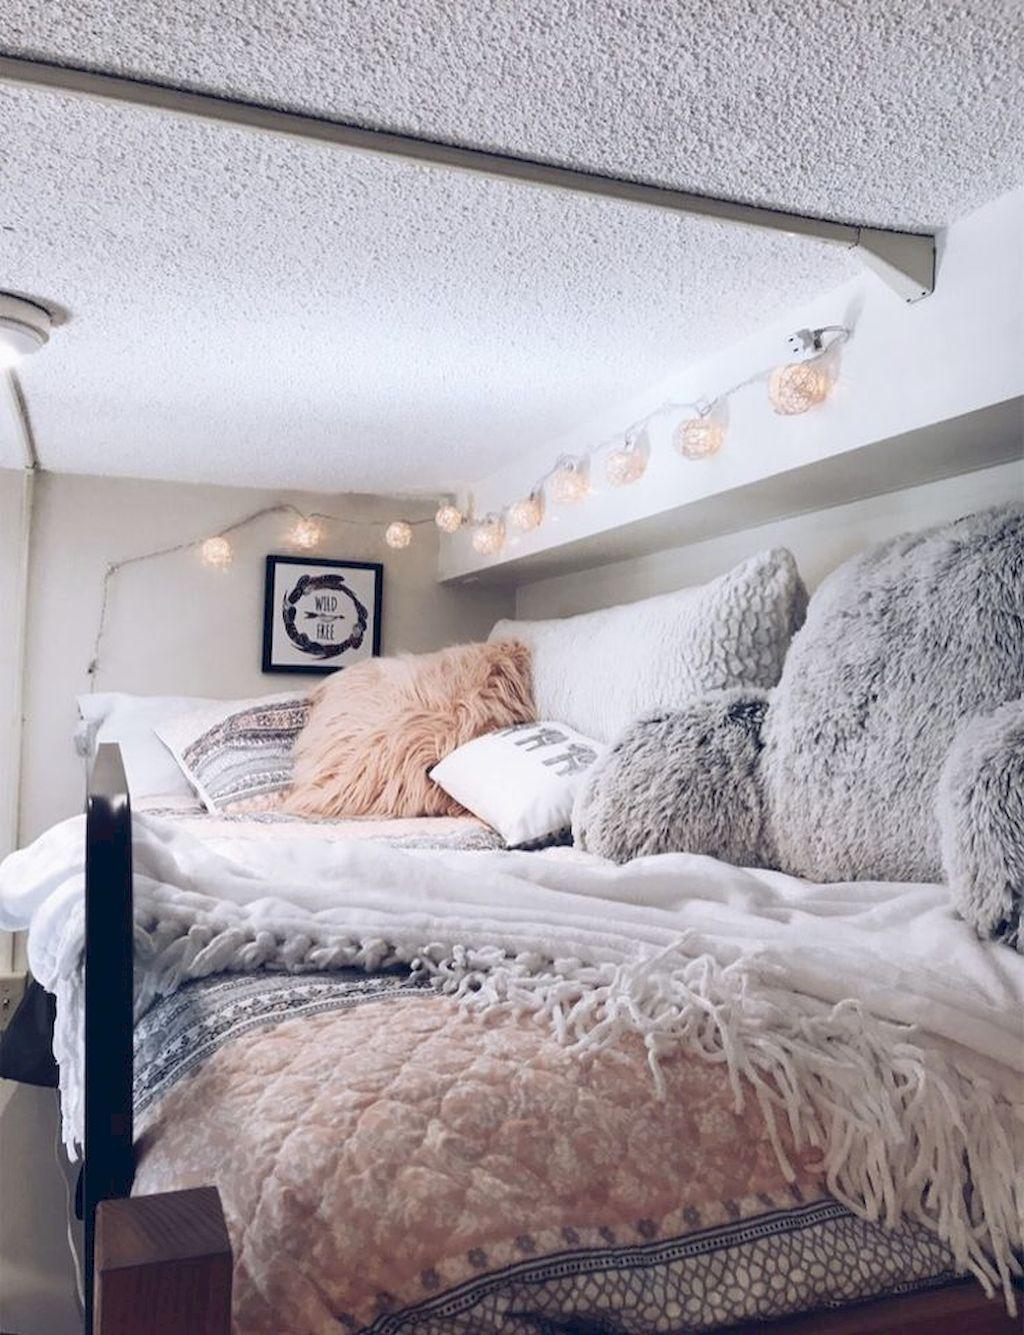 College loft bed ideas   genius dorm room decorating ideas on a budget  college D O R M